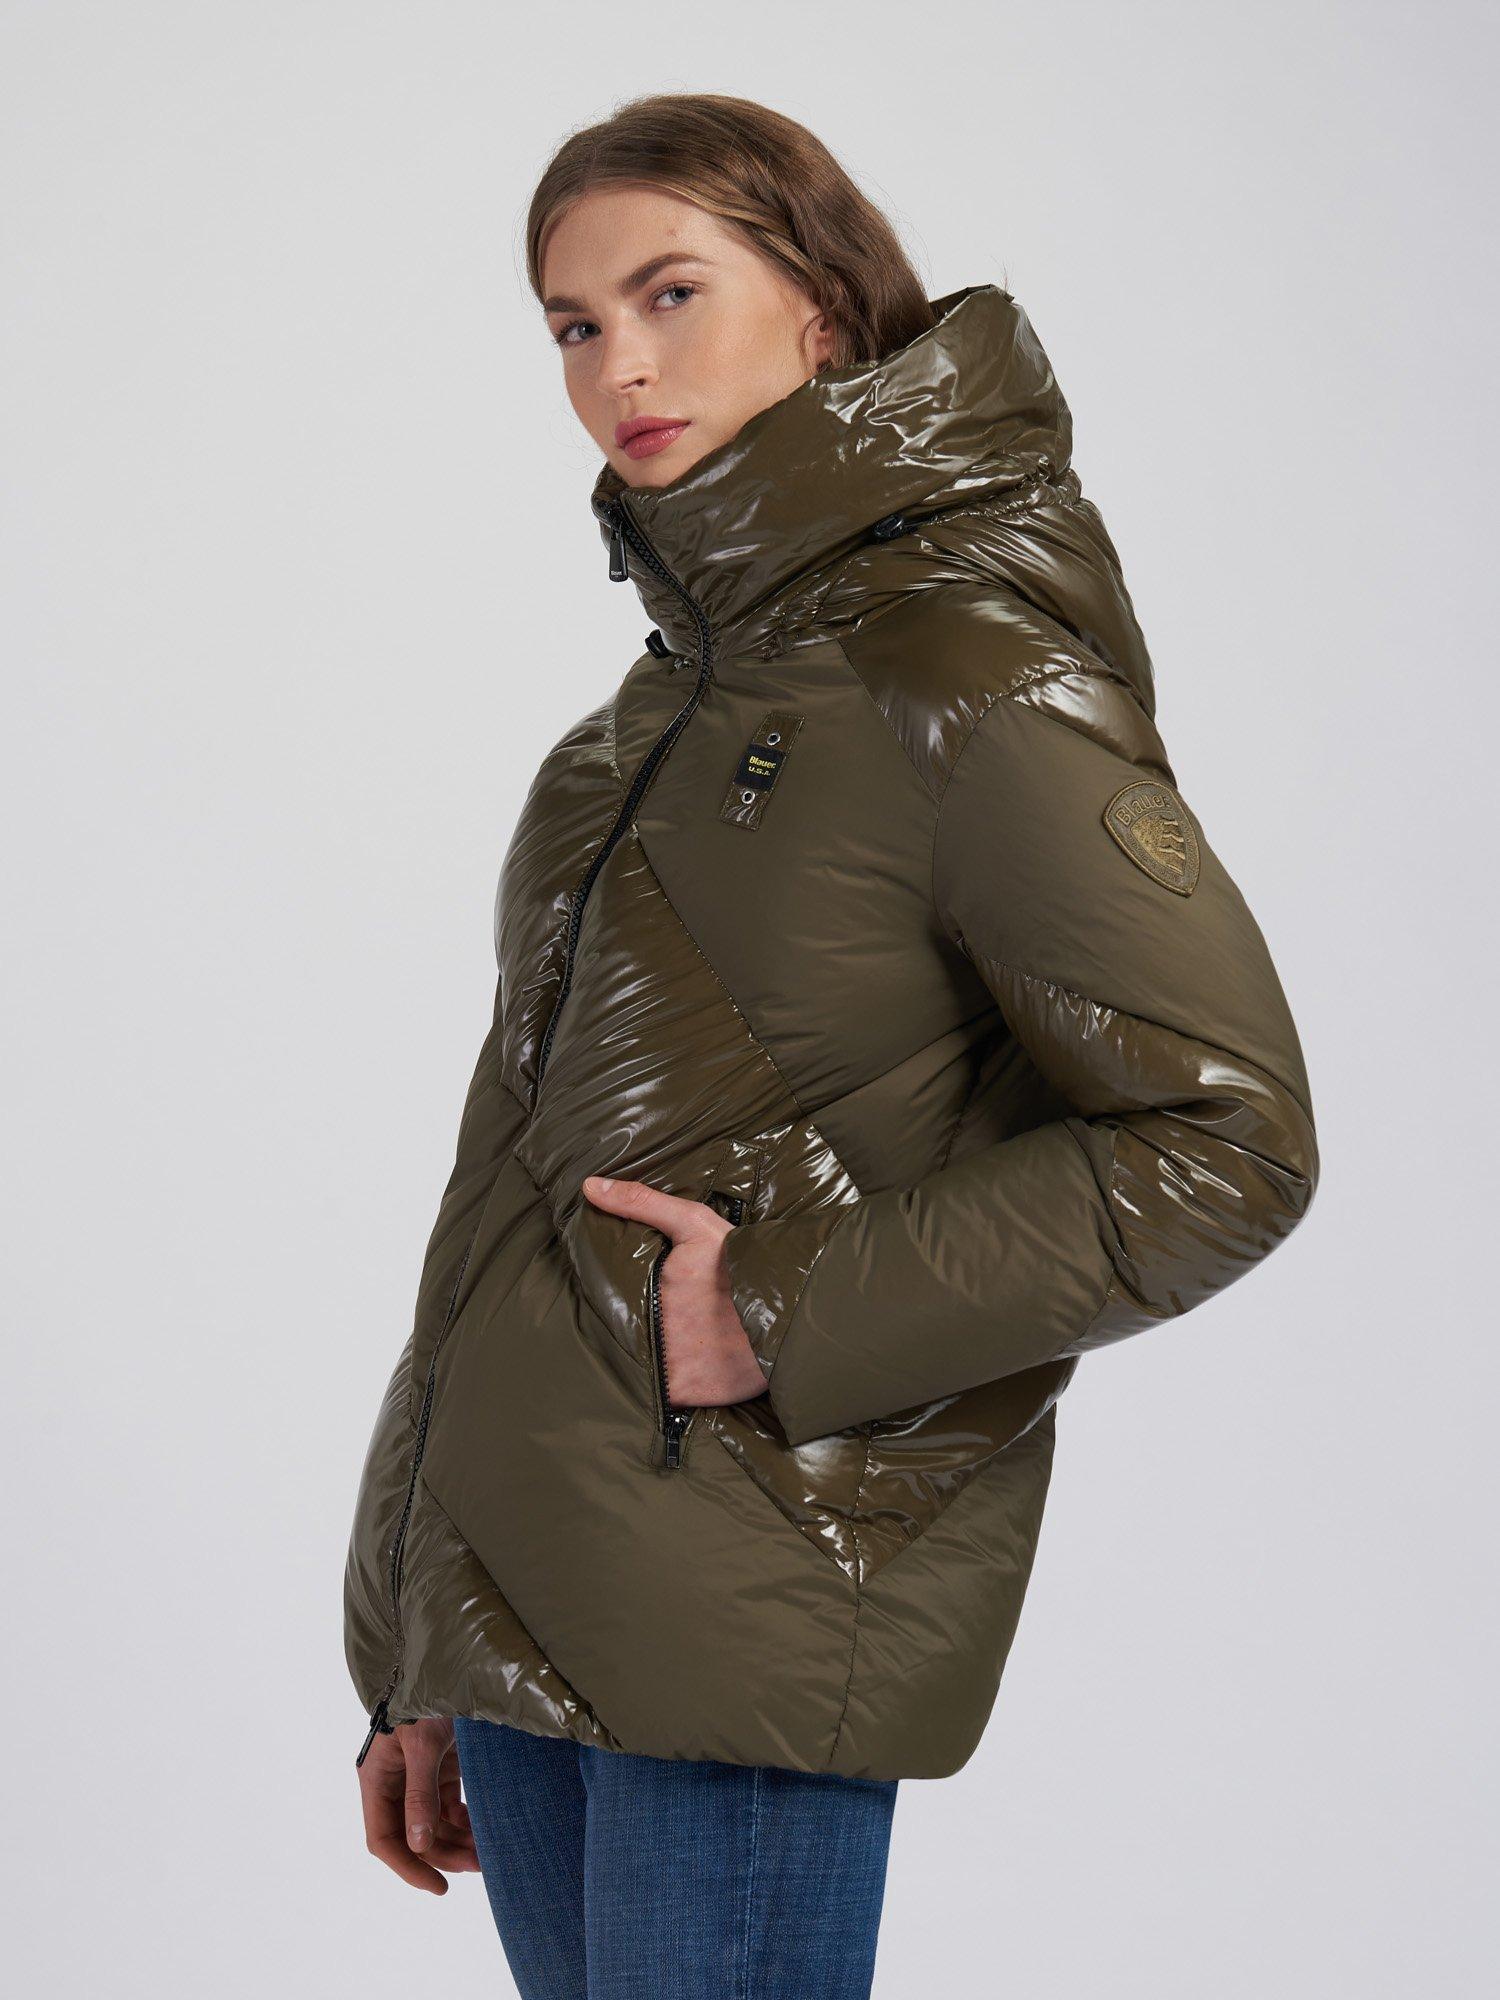 Blauer - ANNA SHINY-MATTE DOWN JACKET - Light Military Green - Blauer